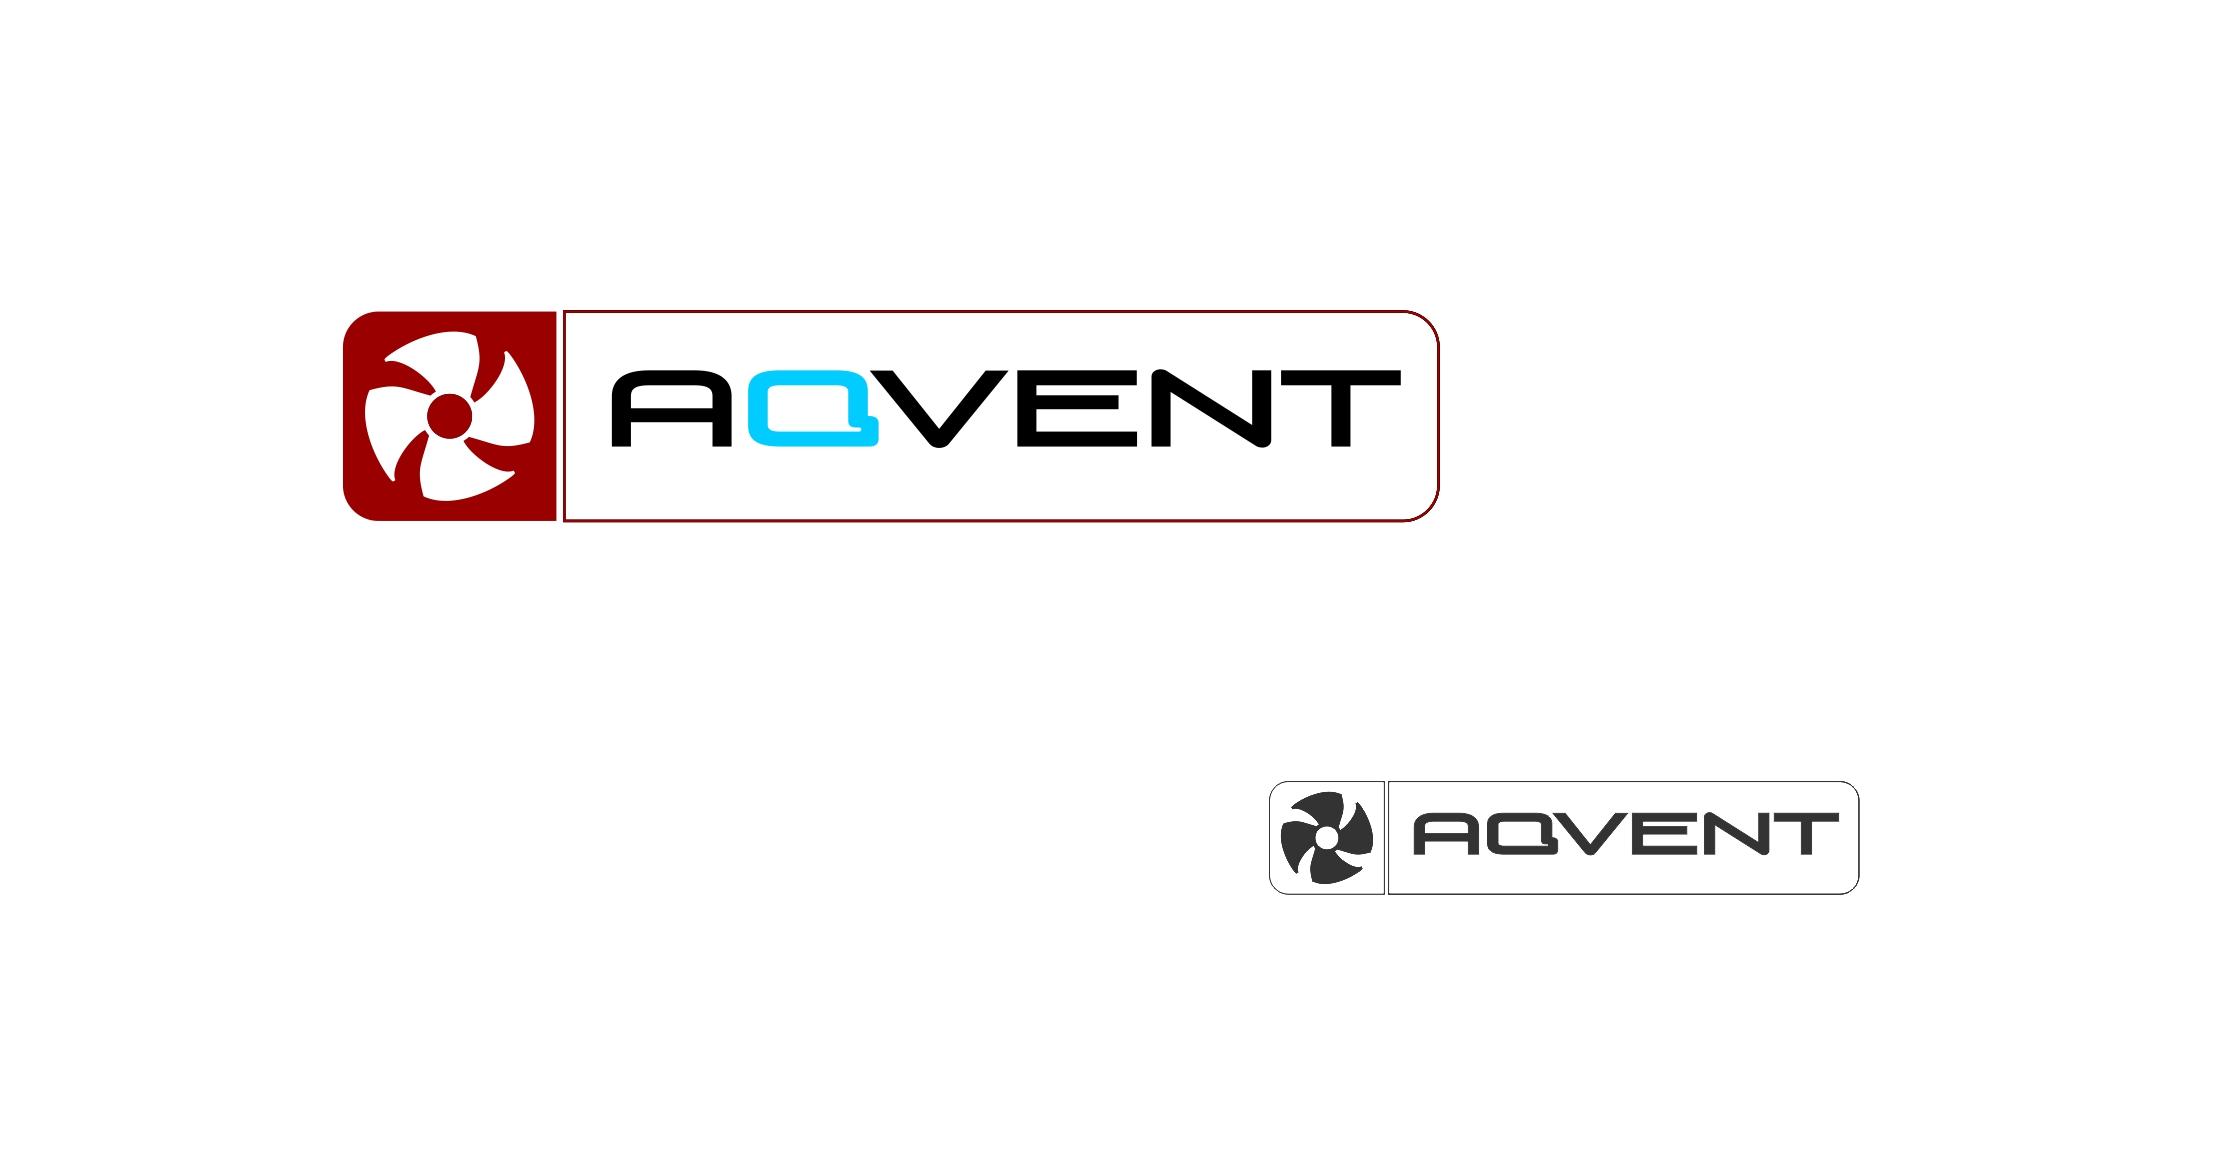 Логотип AQVENT фото f_161527d2af783bed.jpg